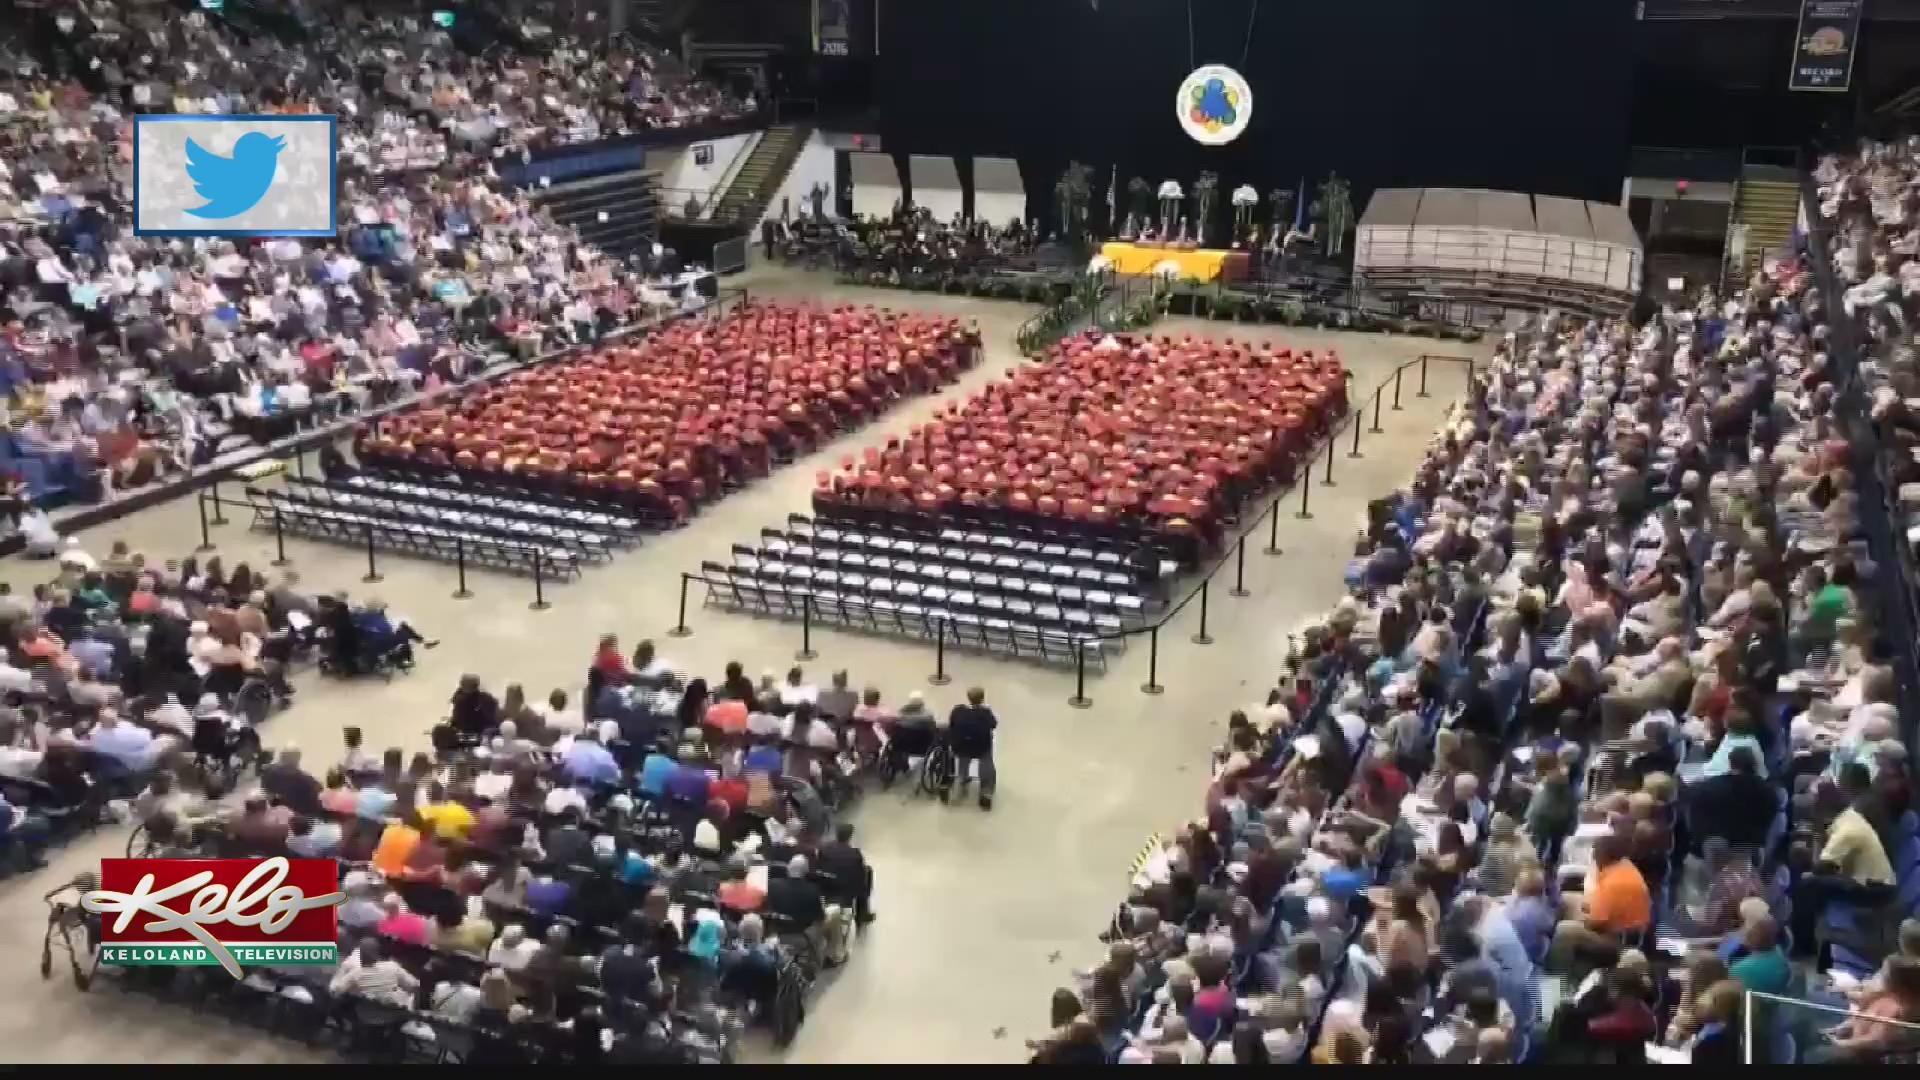 Sioux Fallspublic schools hold their graduation ceremonies Sunday